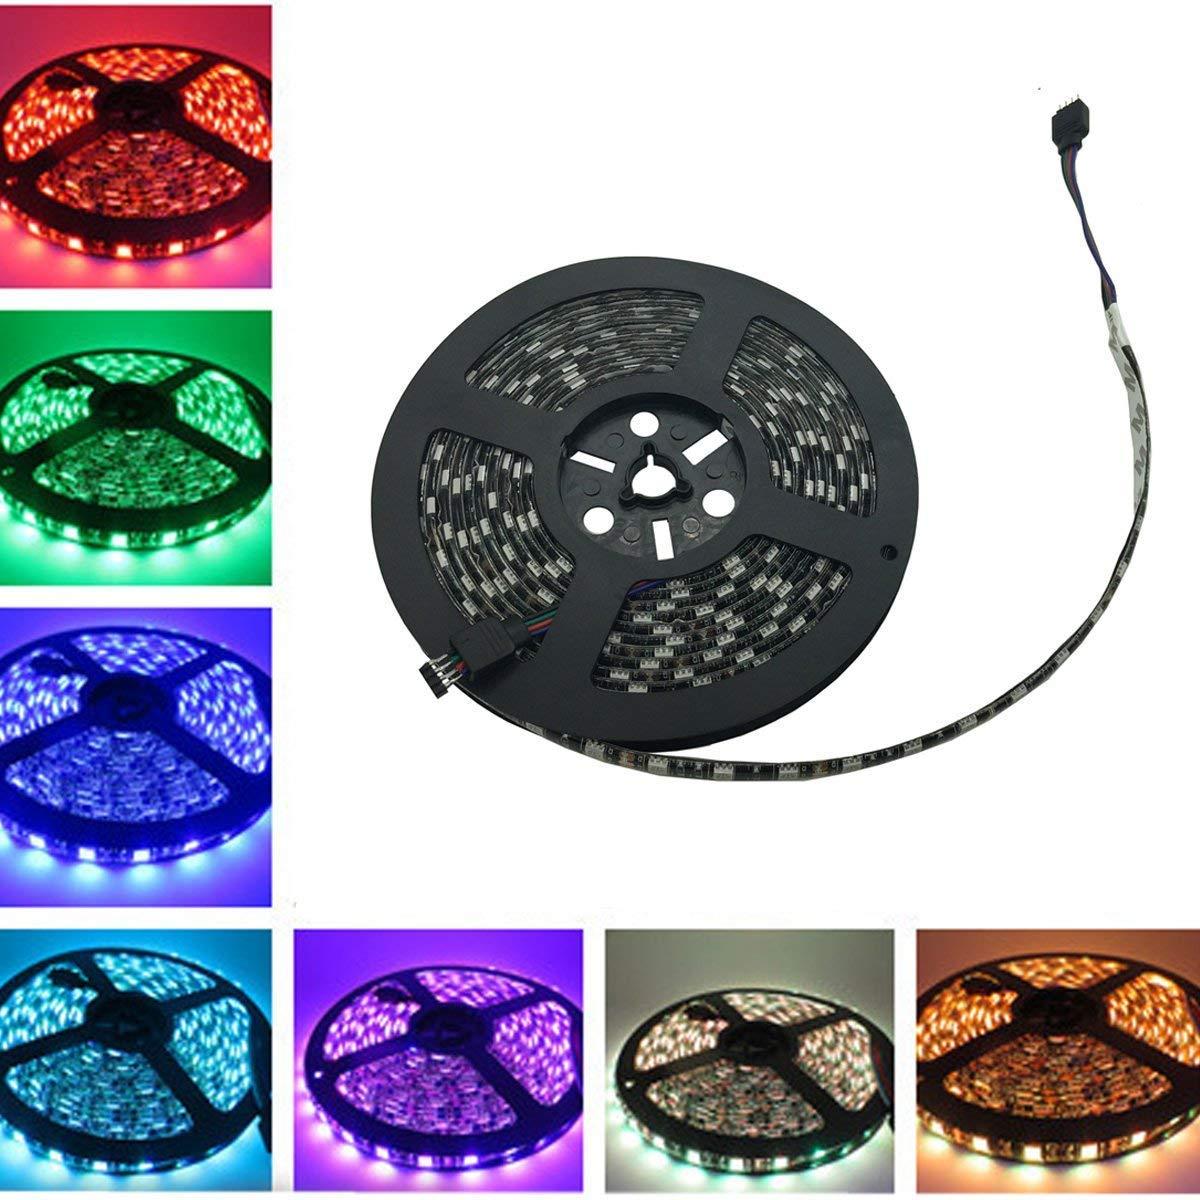 Yolu 1pcs 5 Meter Waterproof LED Strip Lights Kits 300SMD 5050 Black+7color